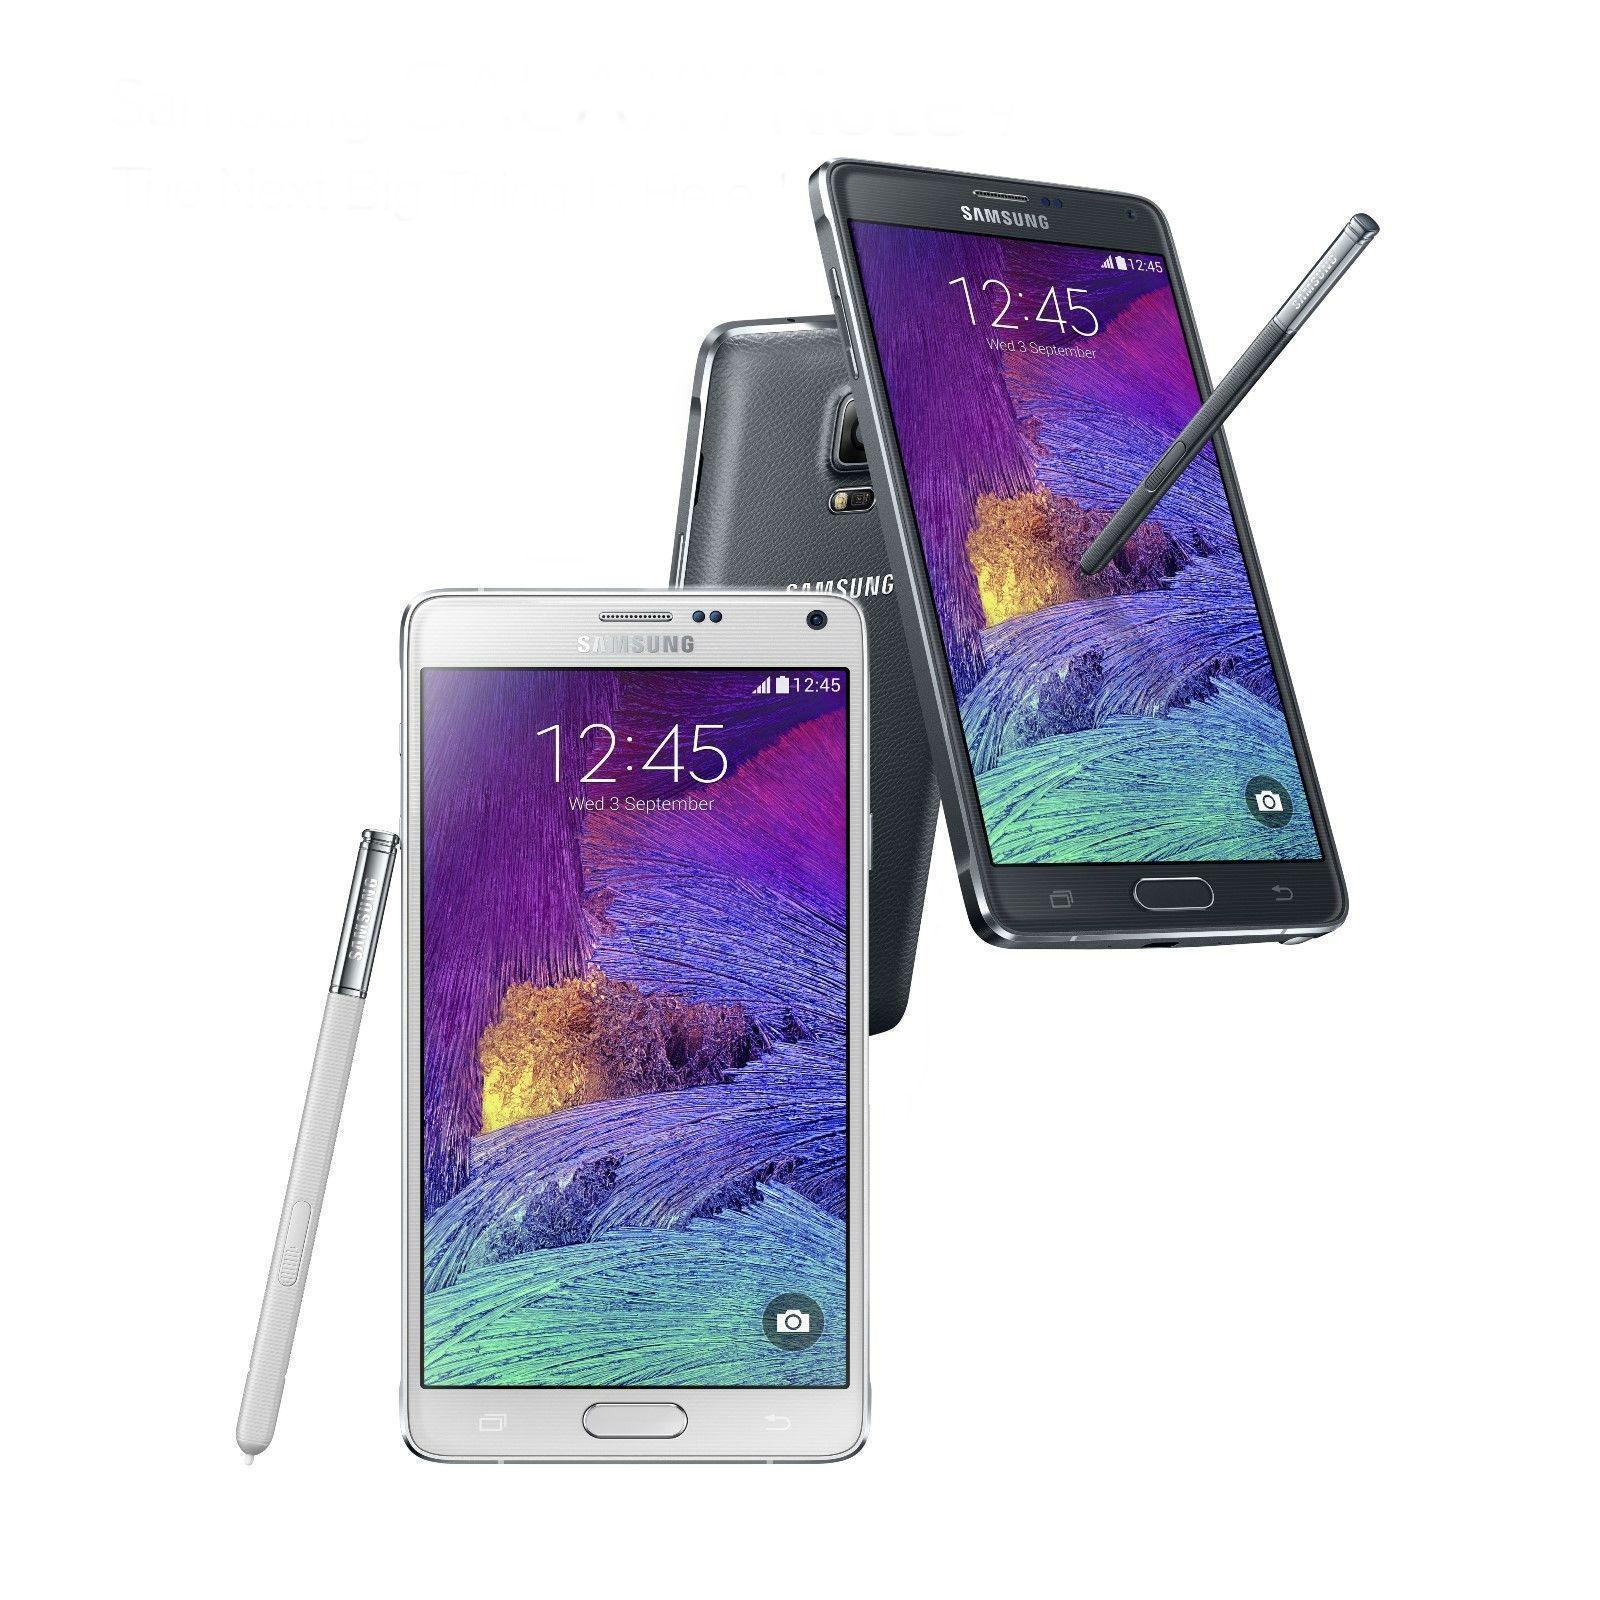 Samsung Galaxy Note 4 N910 32GB GSM Unlocked Black & White SHADOW